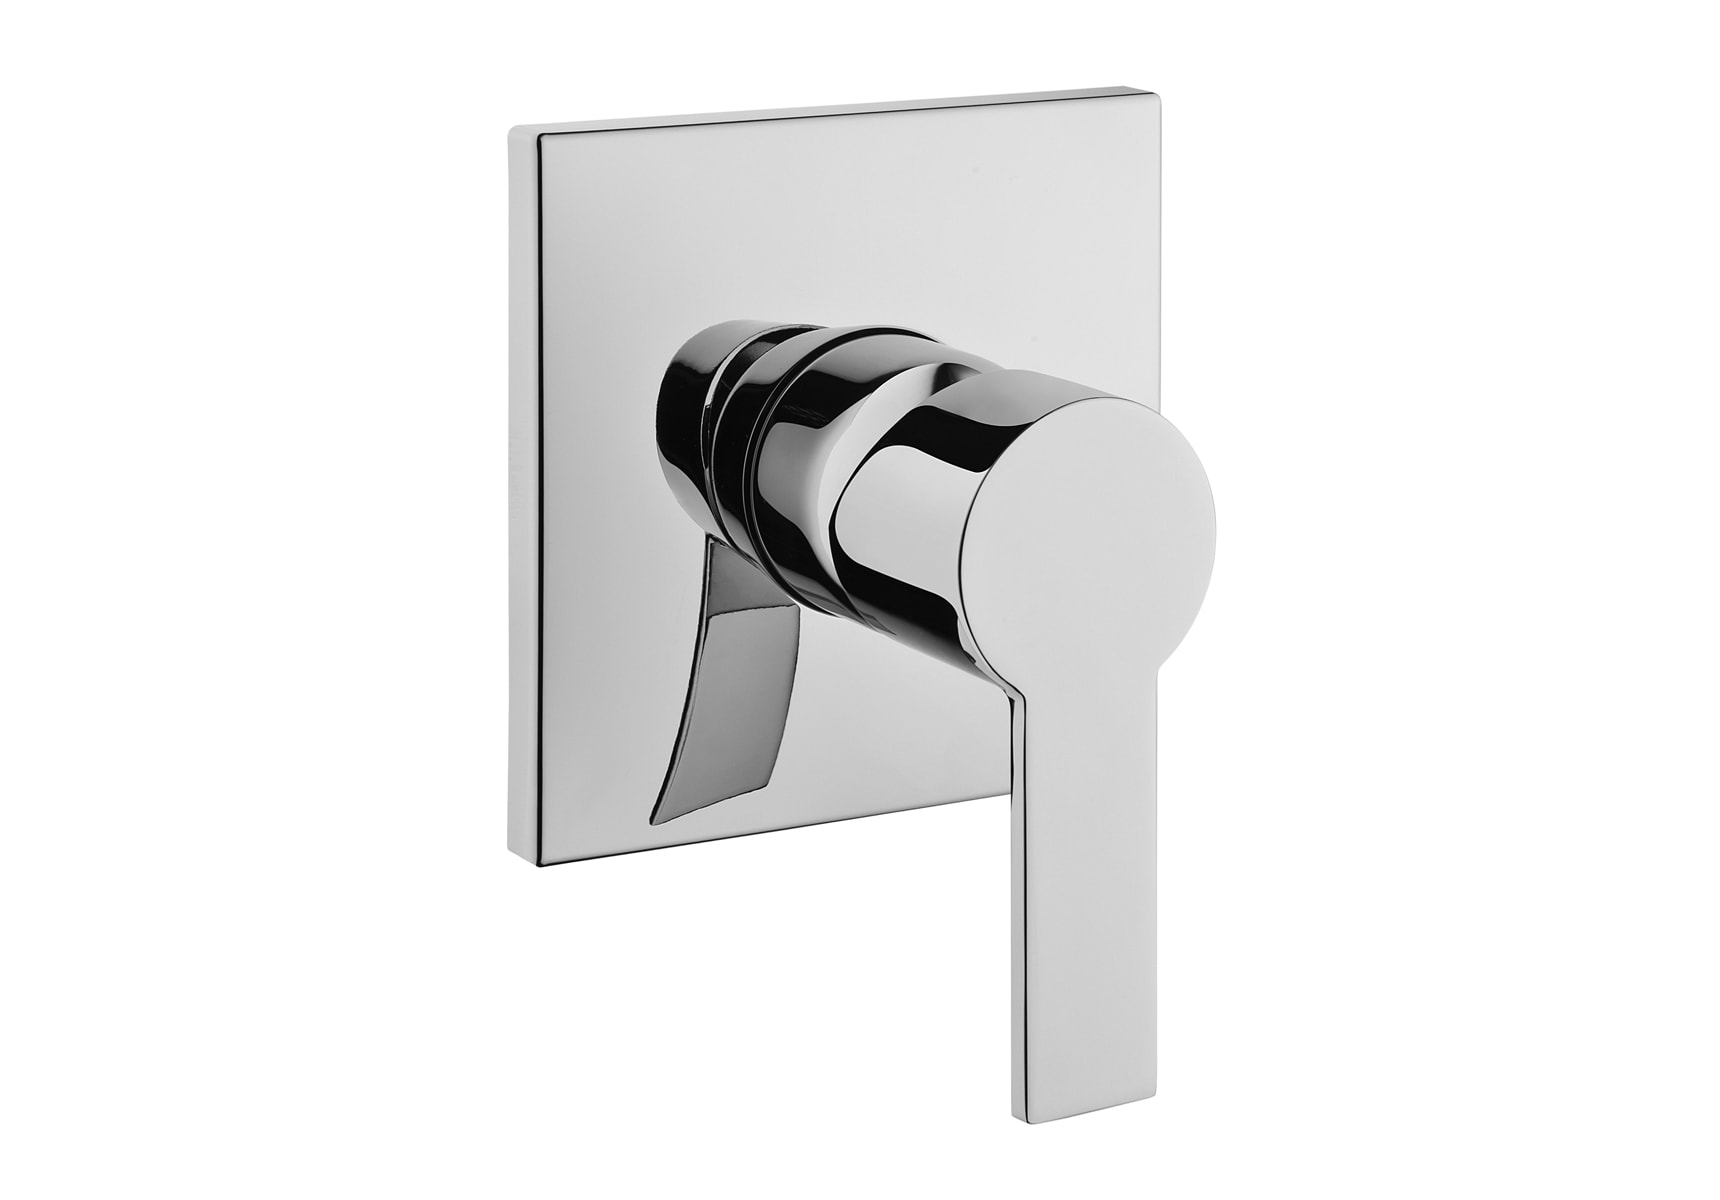 Flo S Built-in Bath/Shower Mixer (Exposed Part)